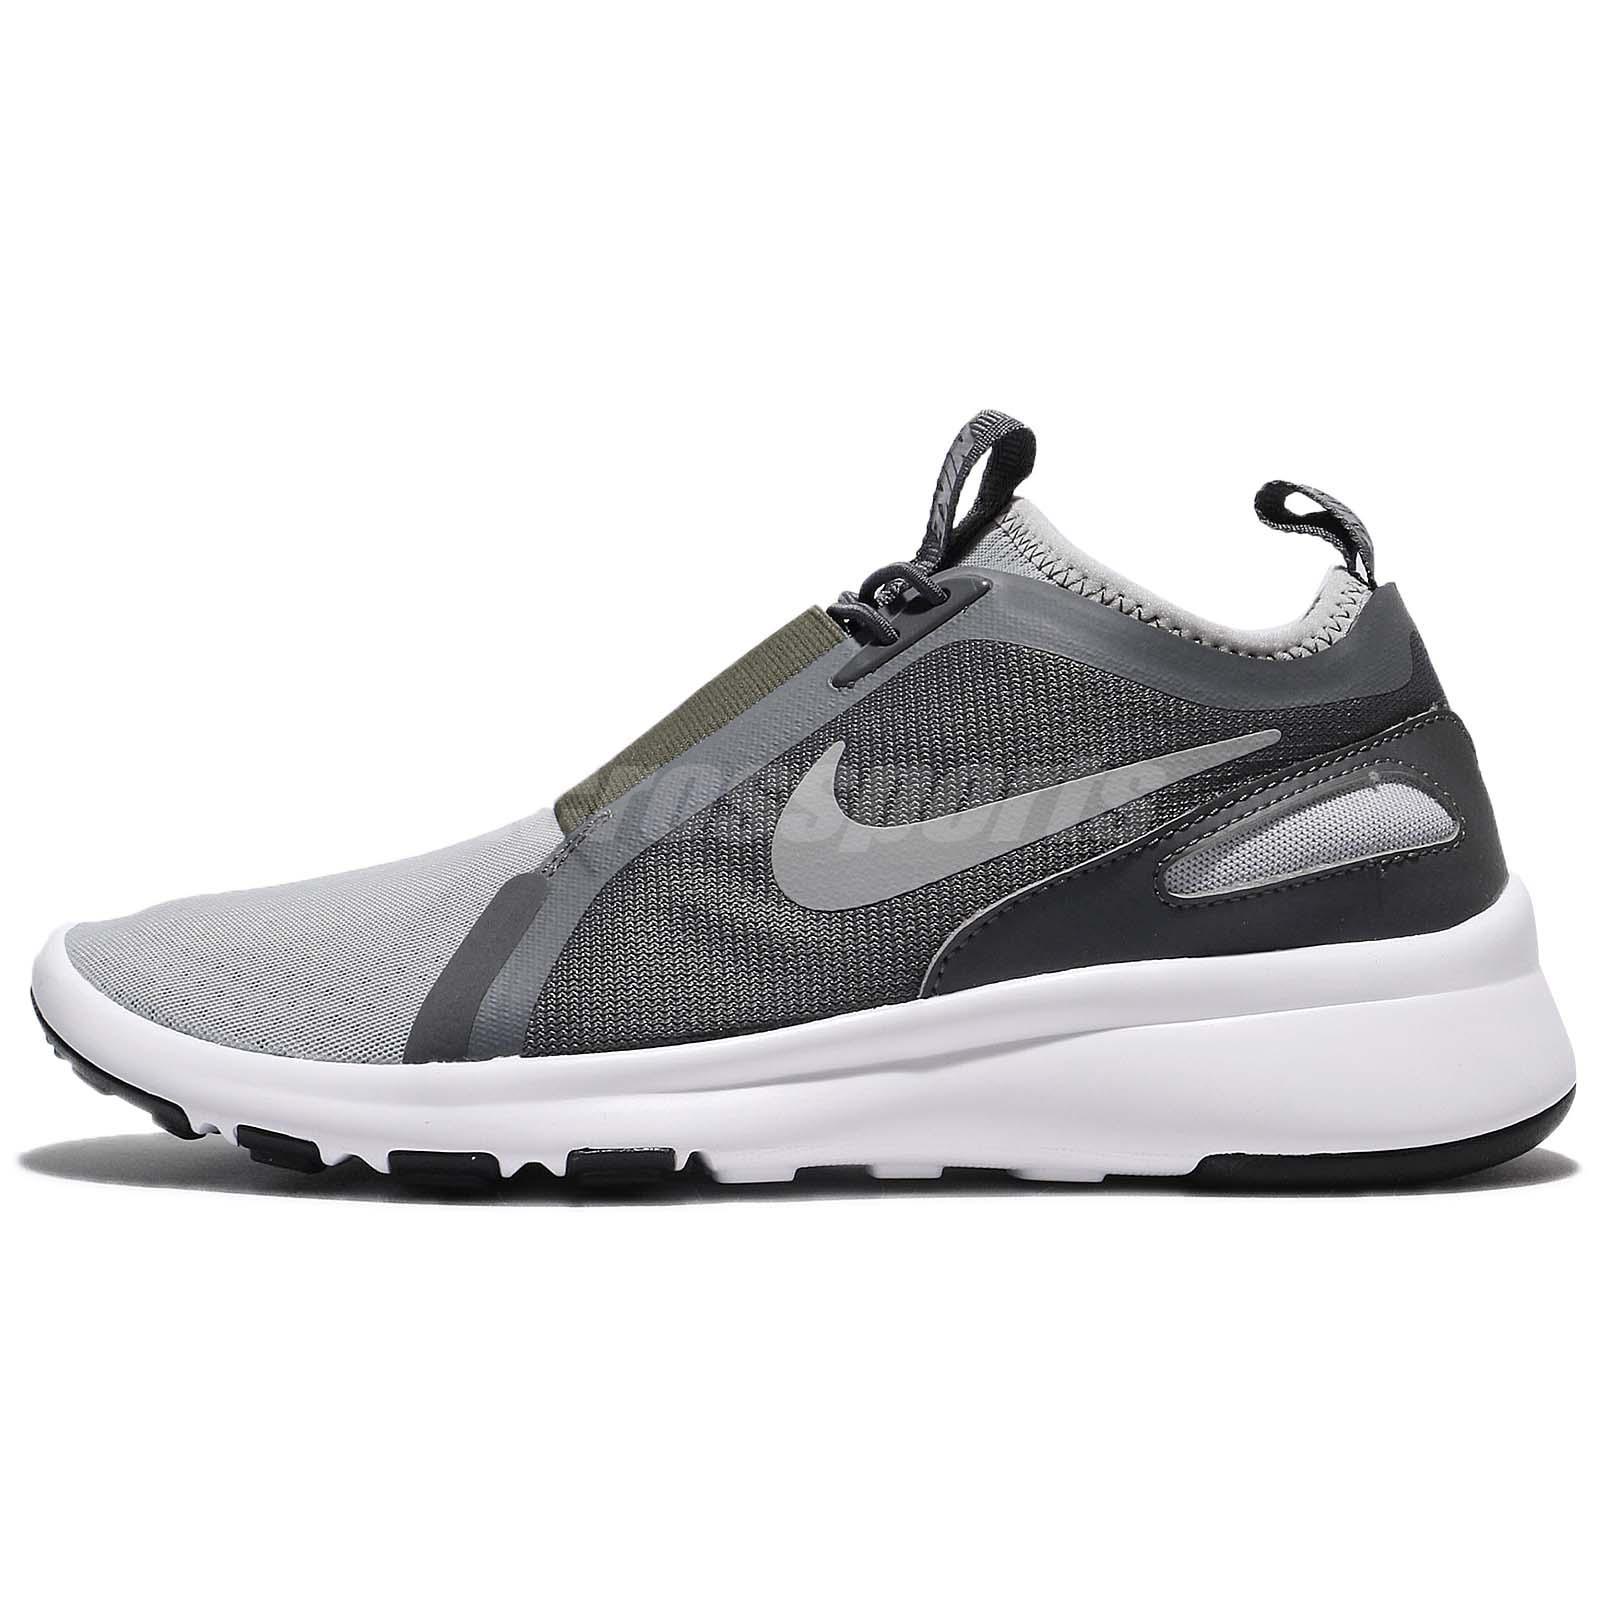 Nike Current Slip On Without Box NWOB